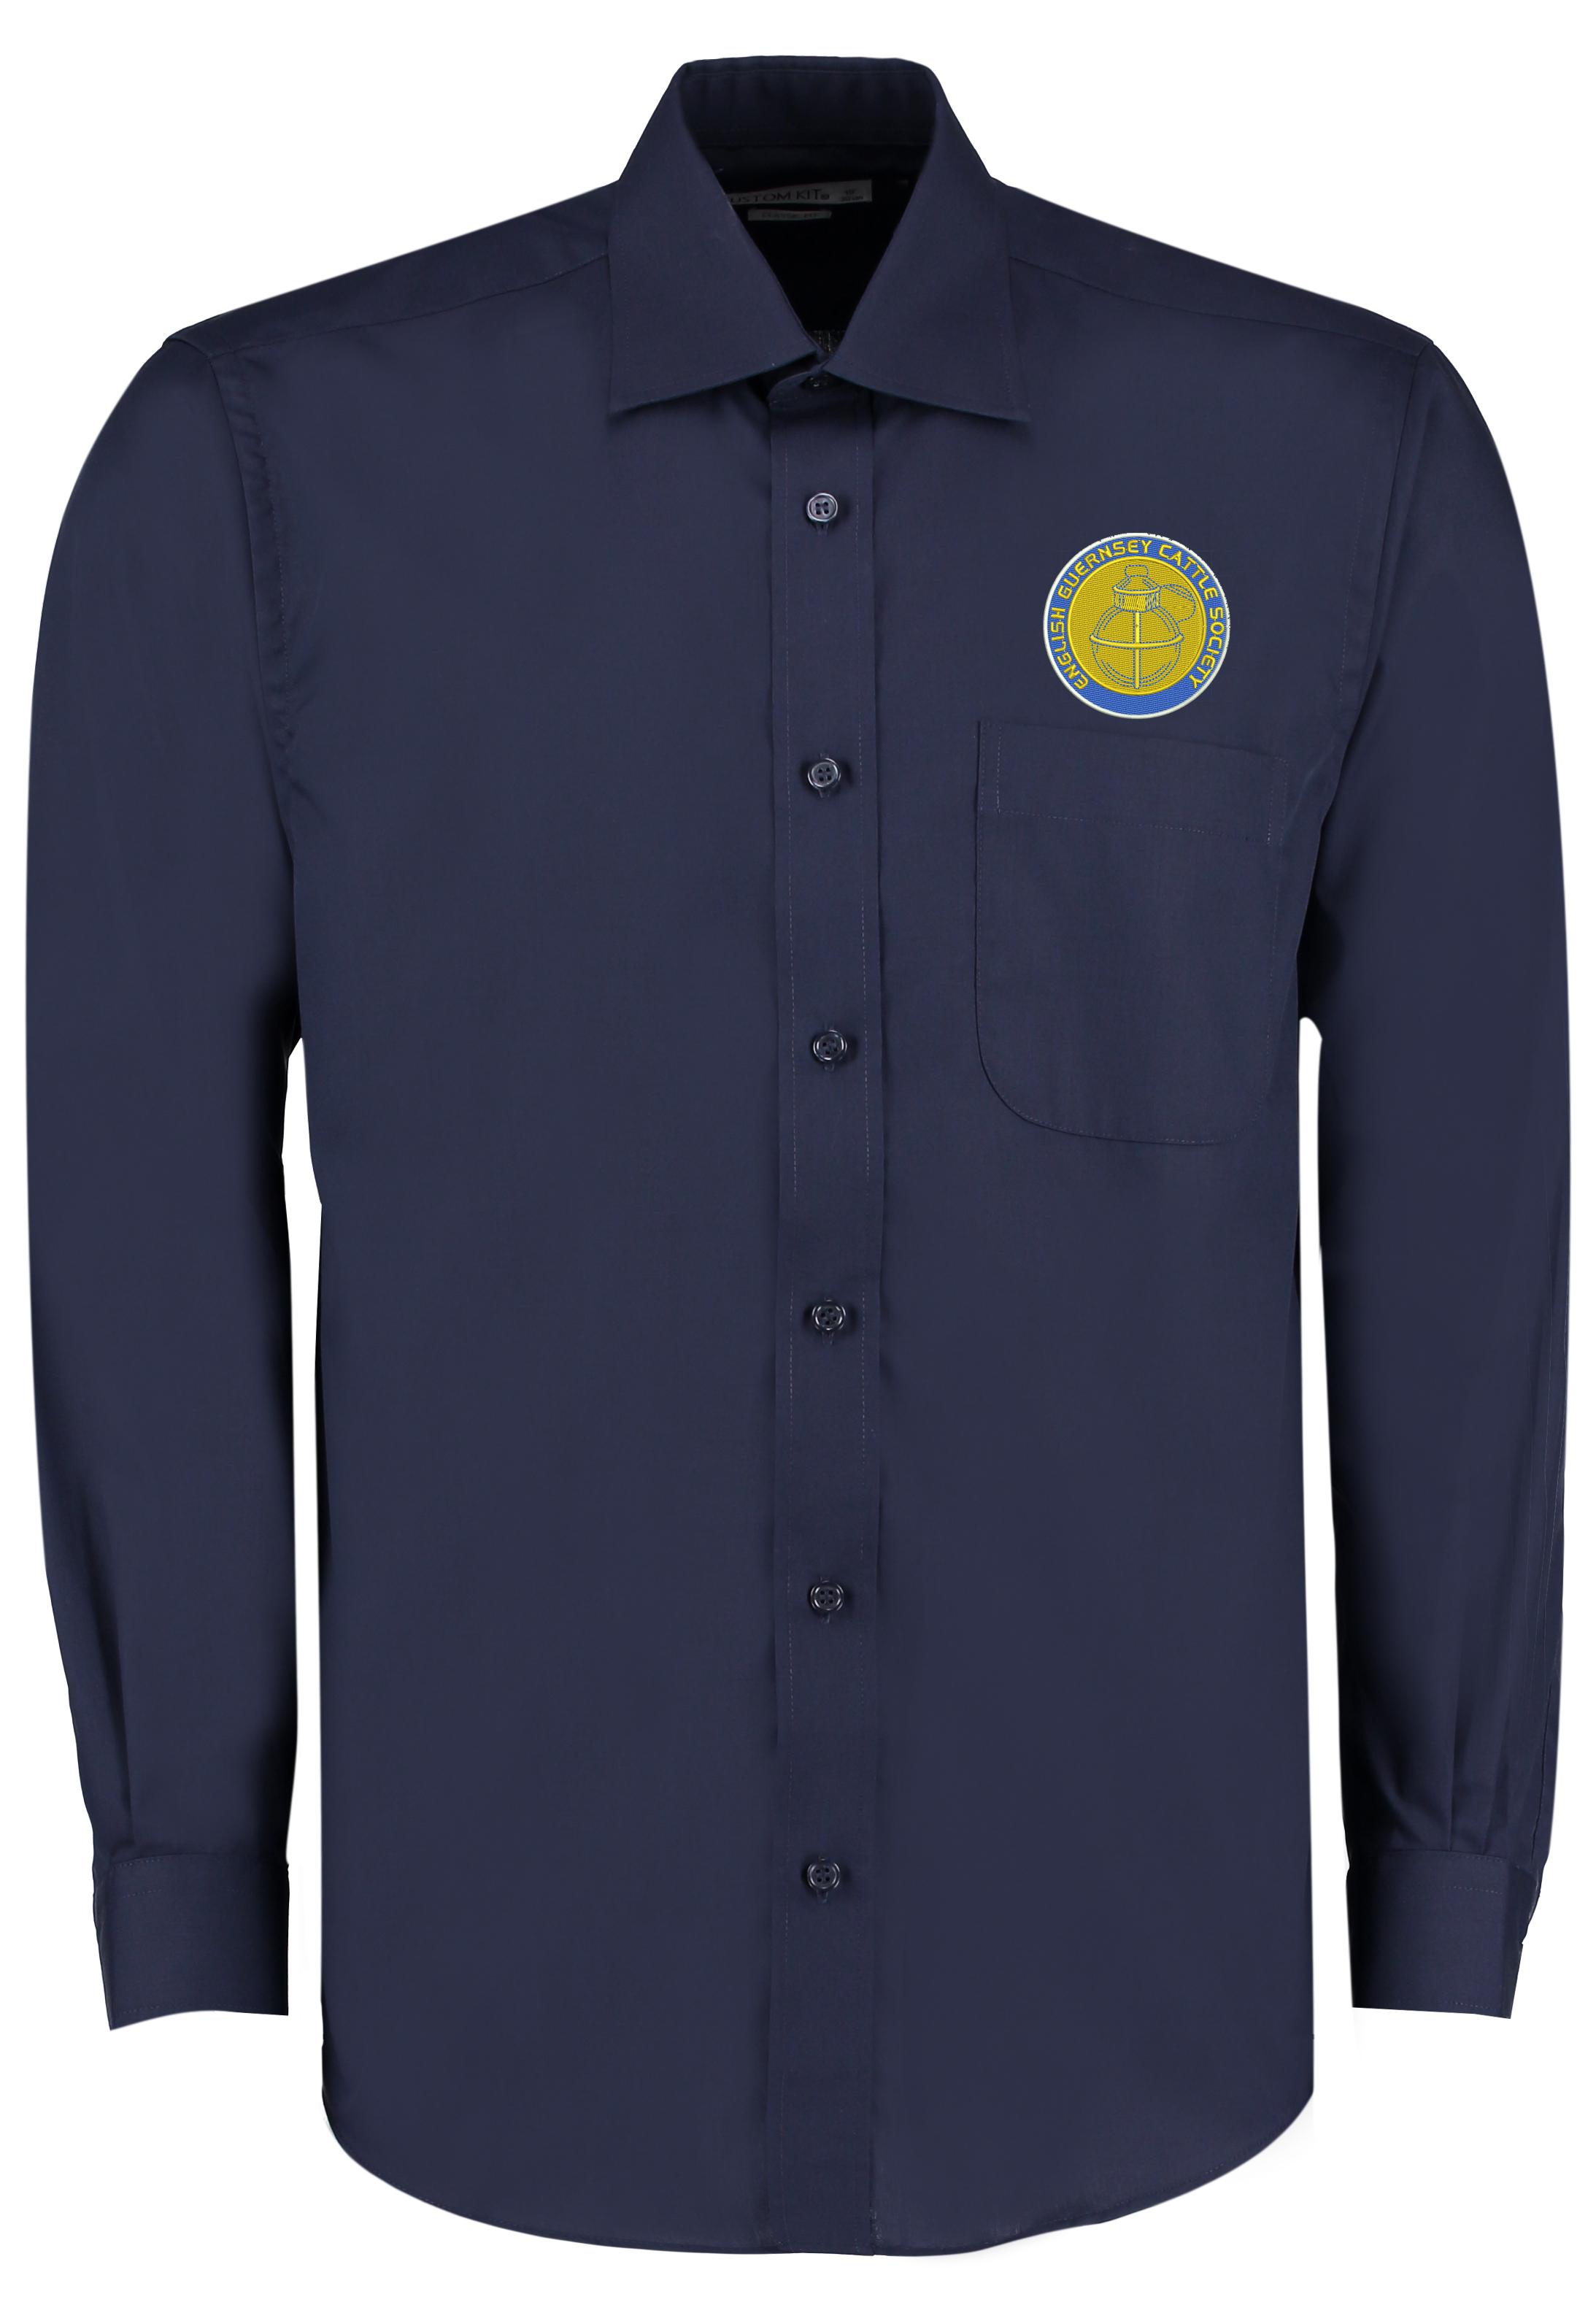 EGCS Mens Long Sleeved Shirt